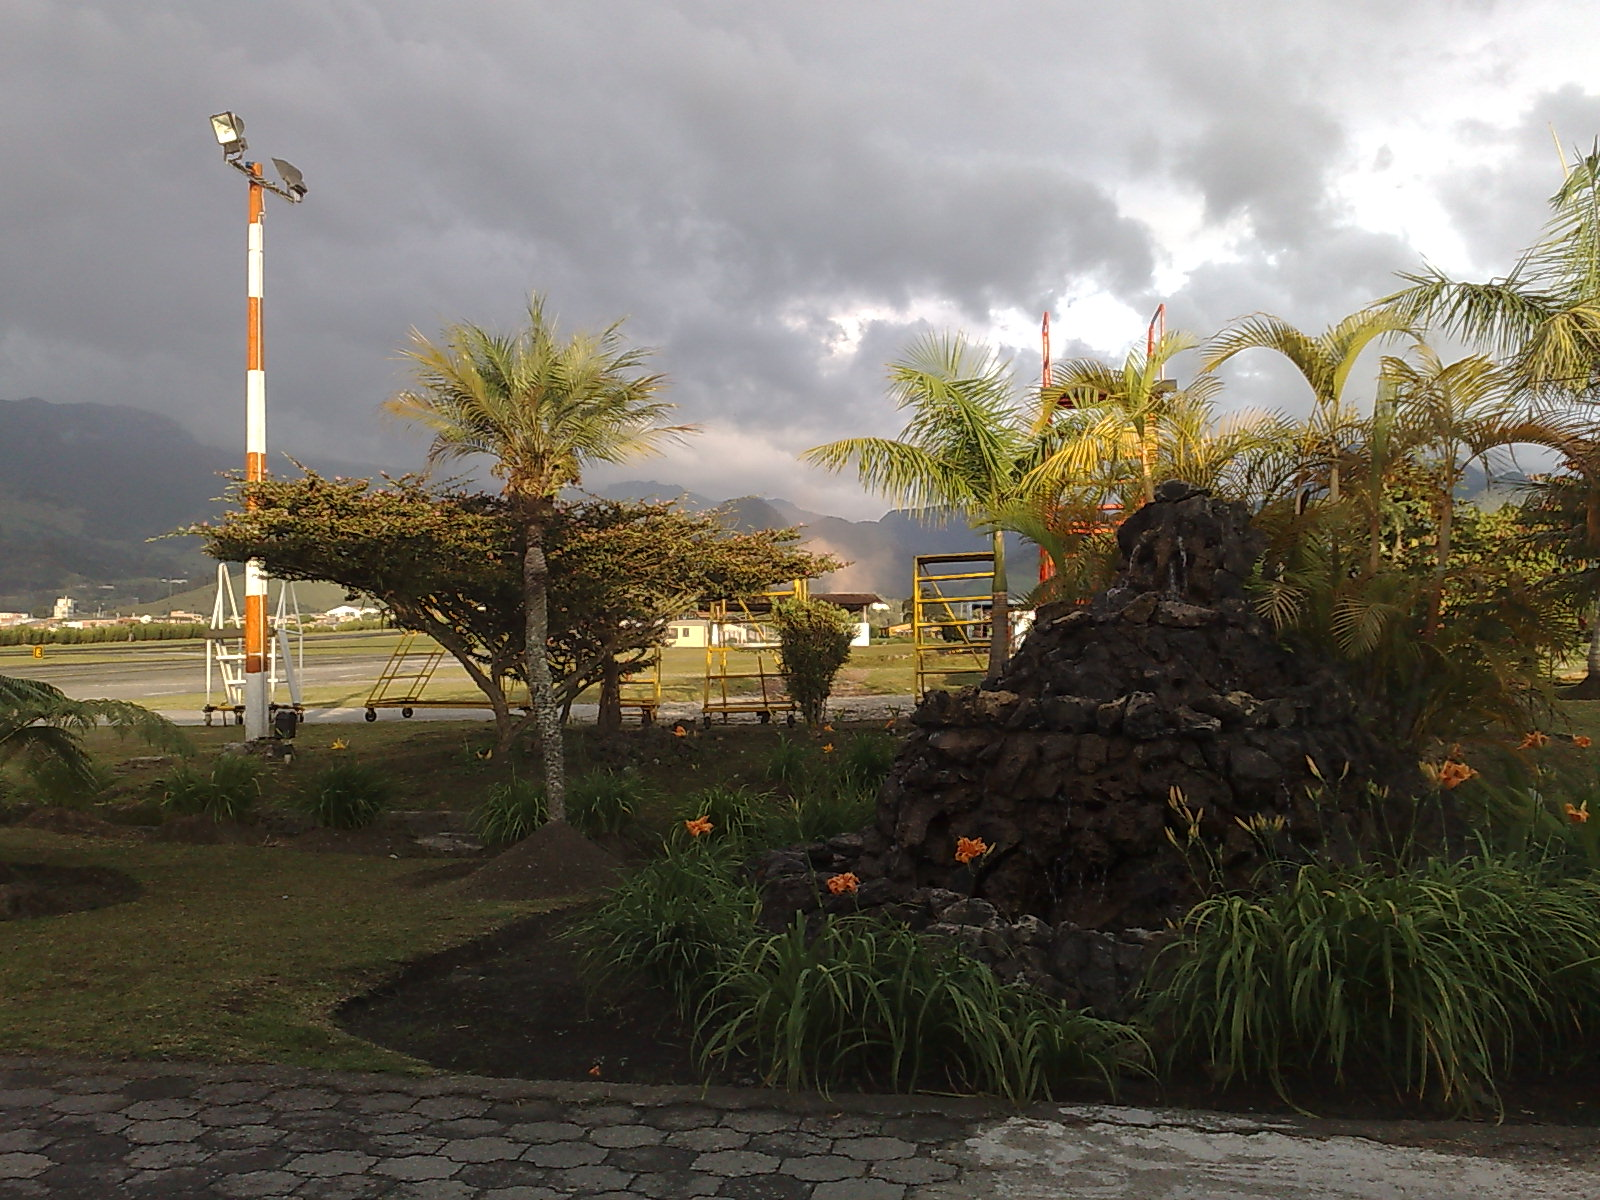 Manizales airport